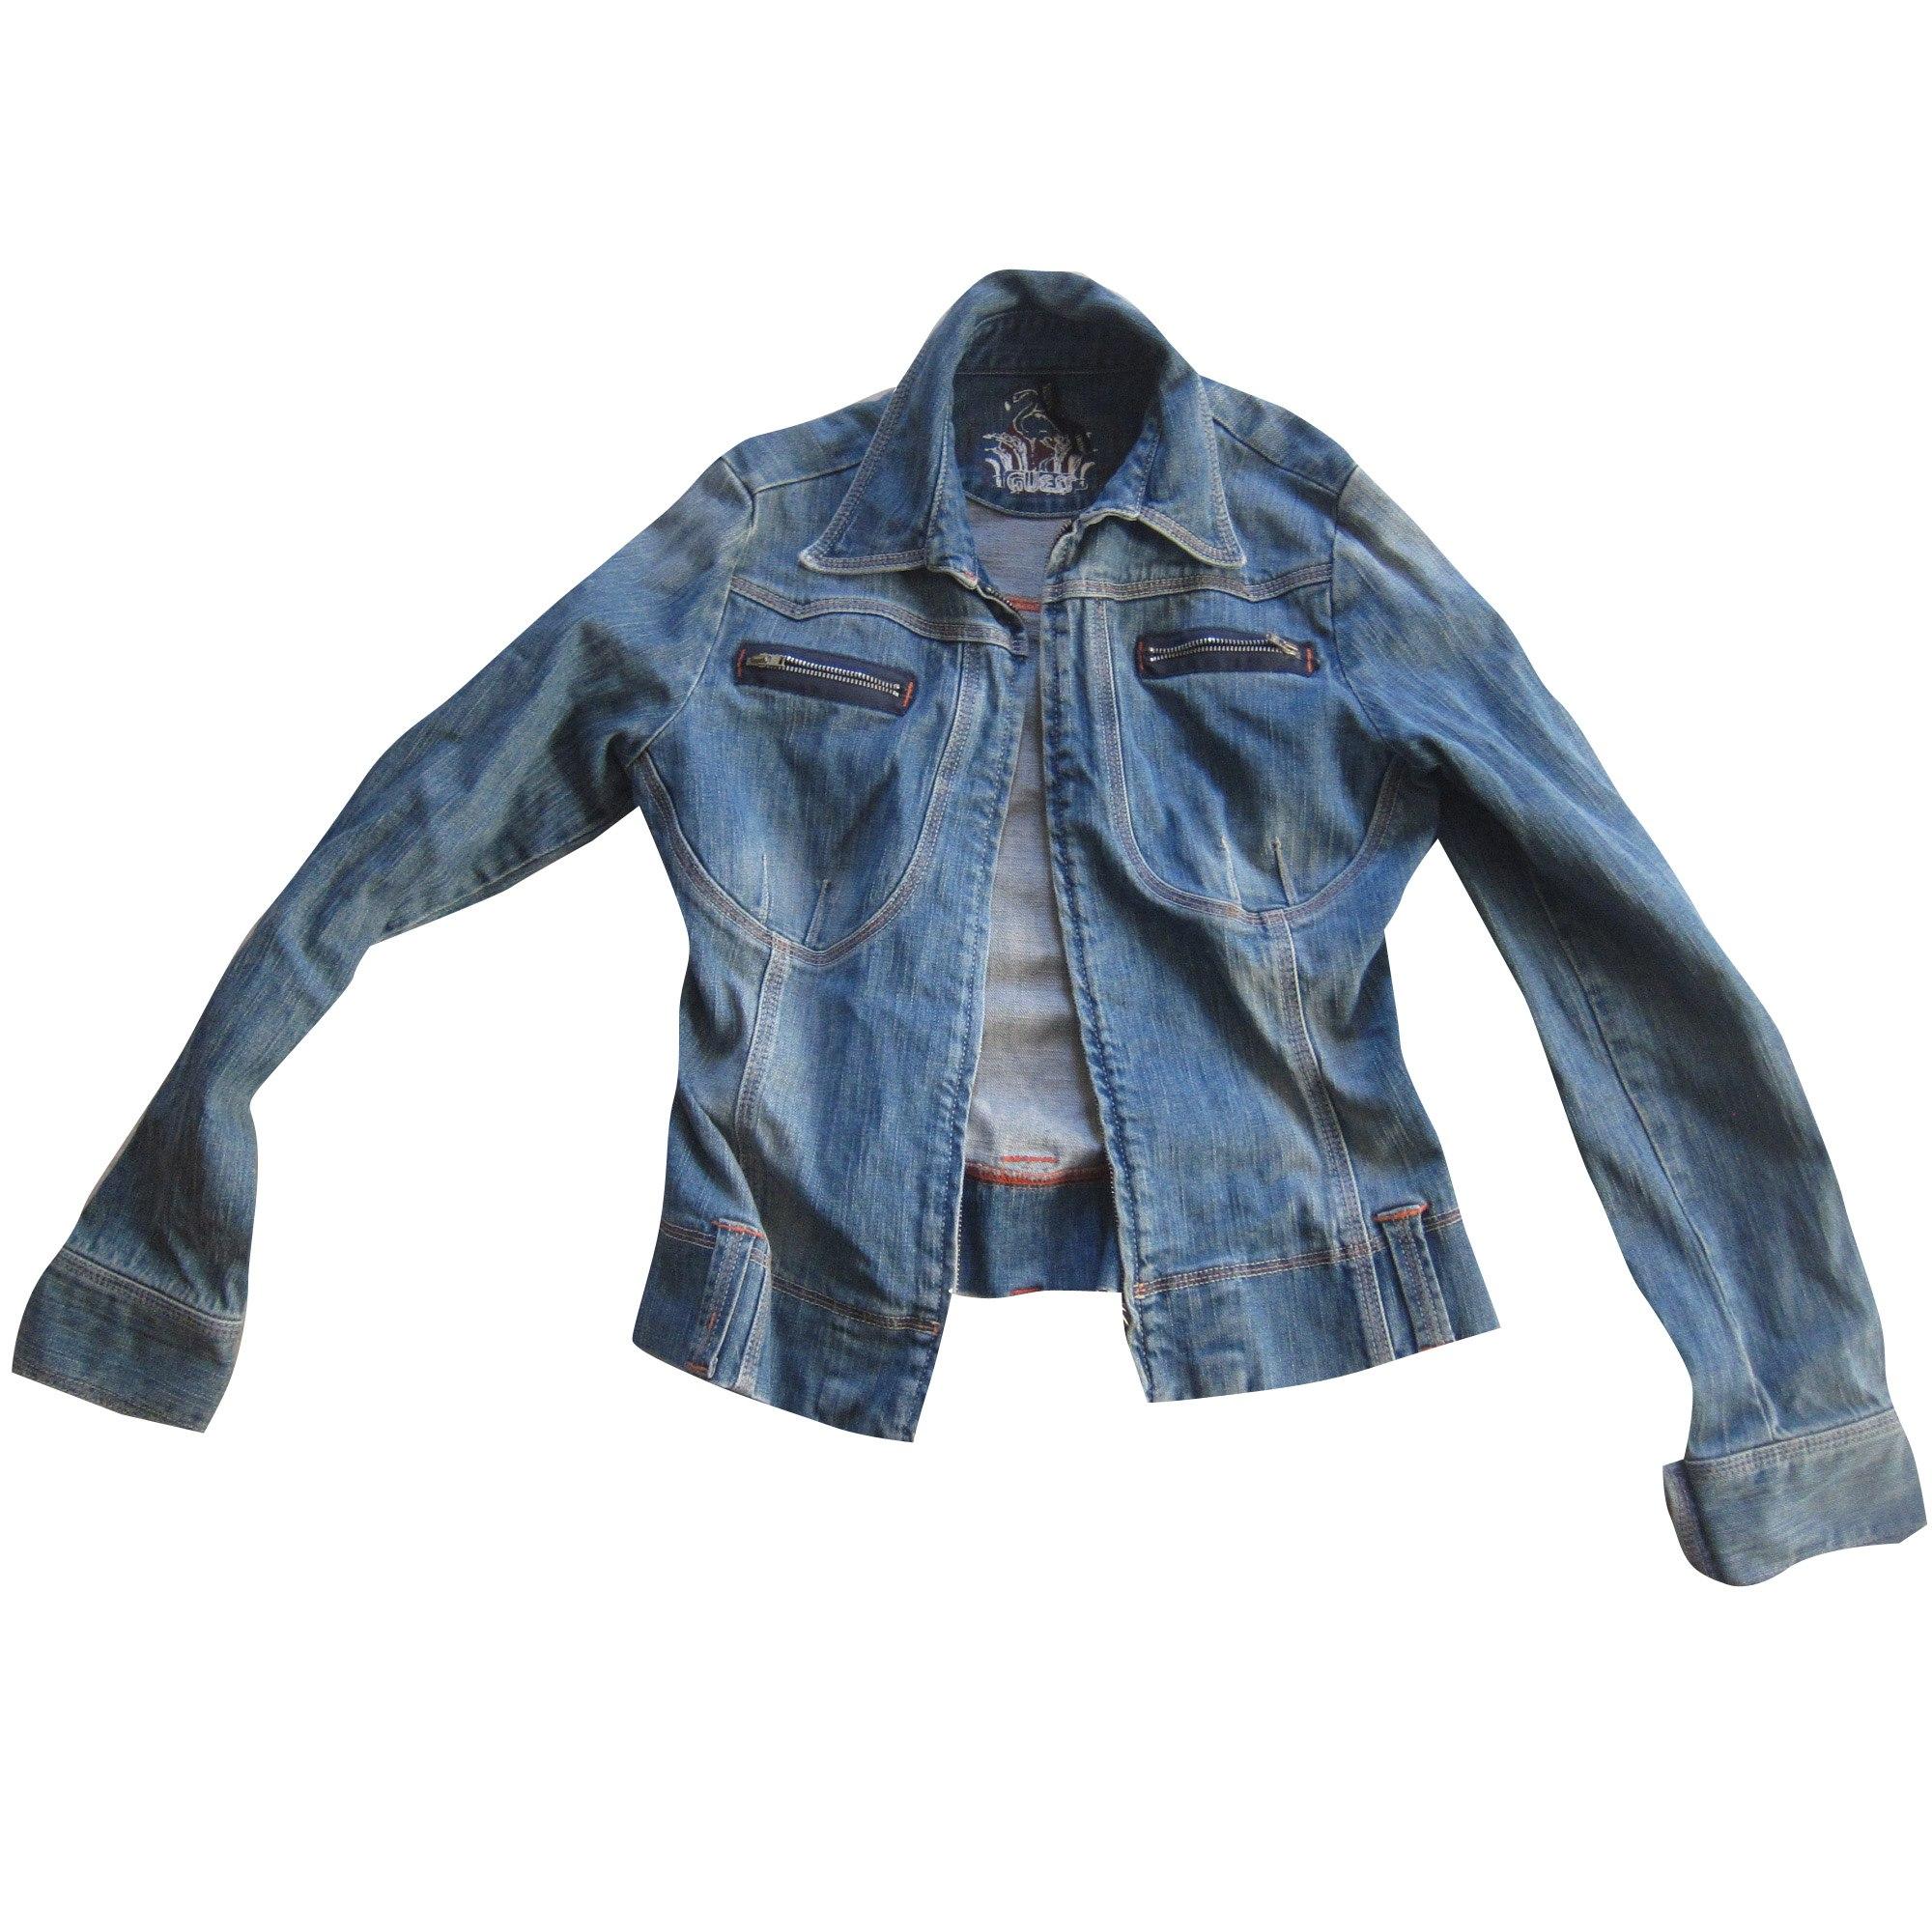 Veste en jean GUESS Bleu, bleu marine, bleu turquoise